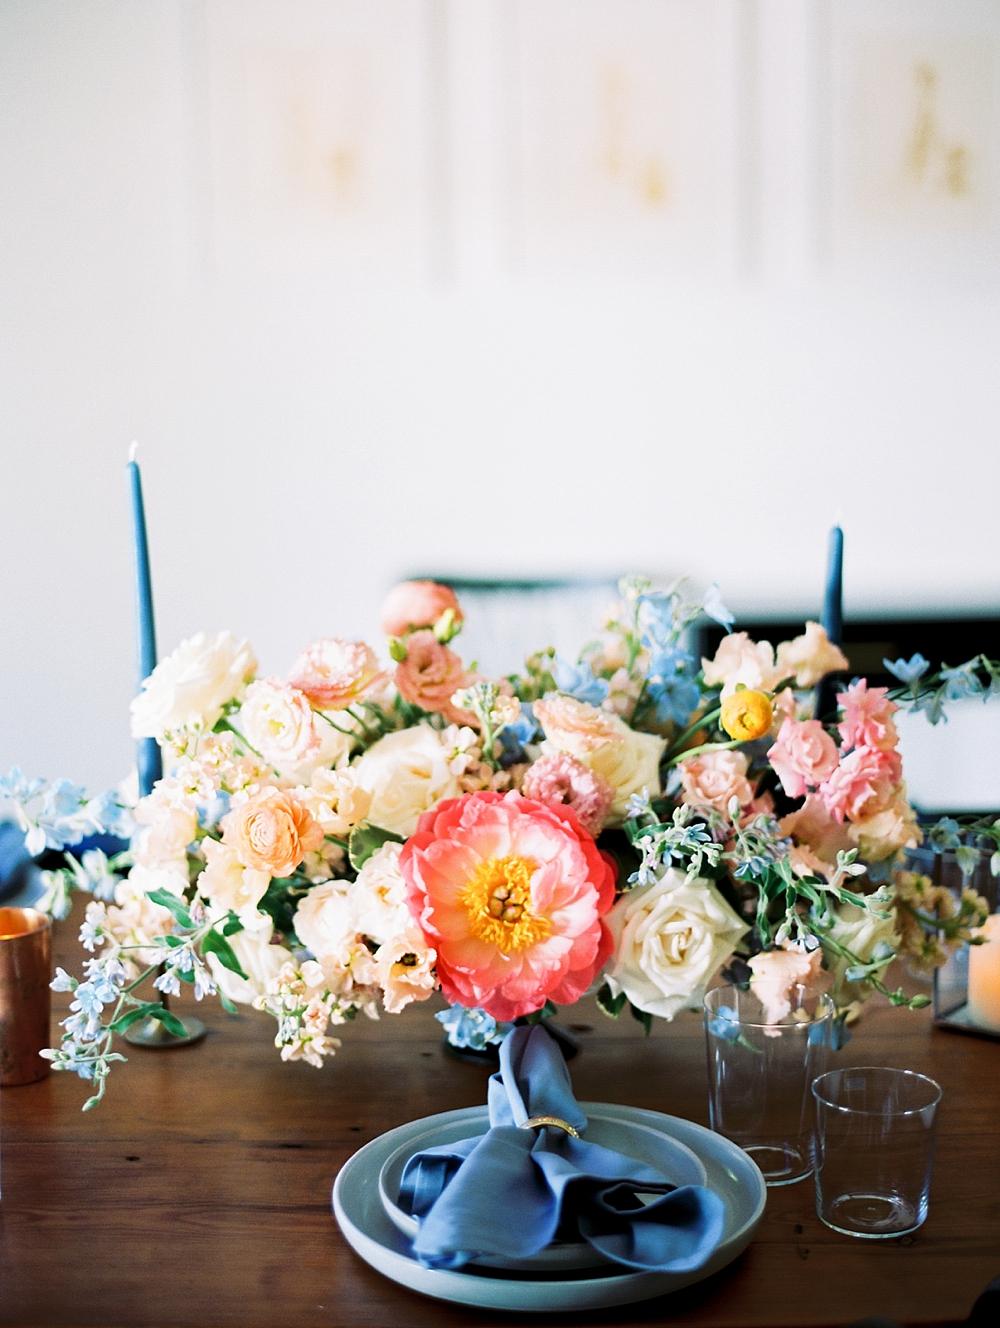 Kristin-La-Voie-Photography-Austin-Wedding-Photographer-the-grand-lady-10